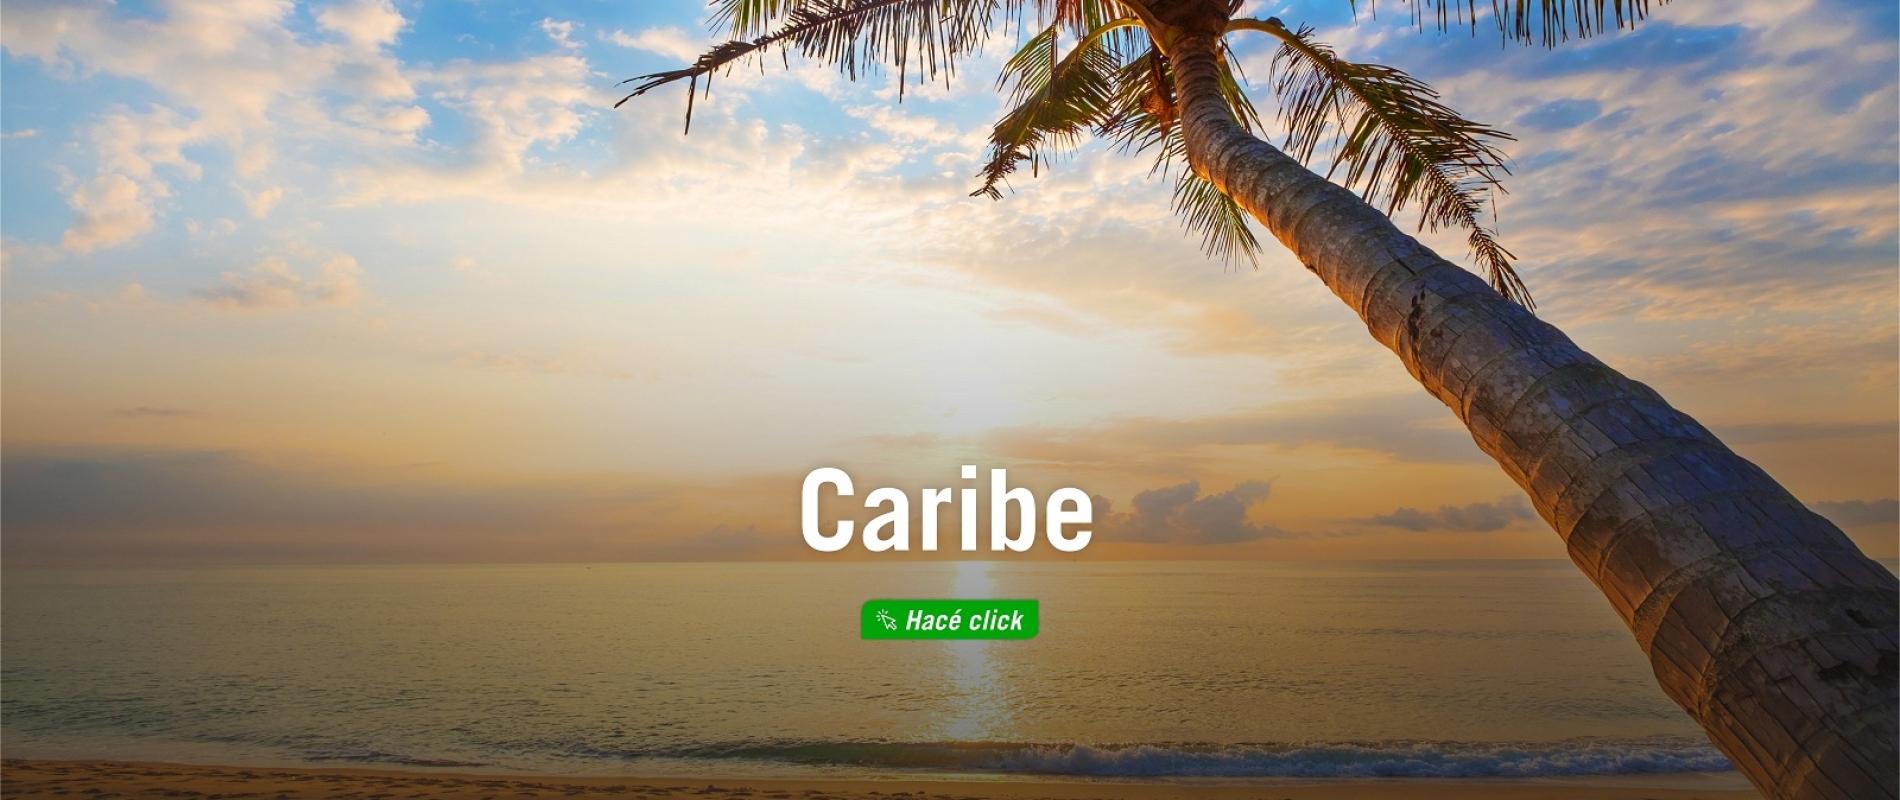 CARIBE HOME